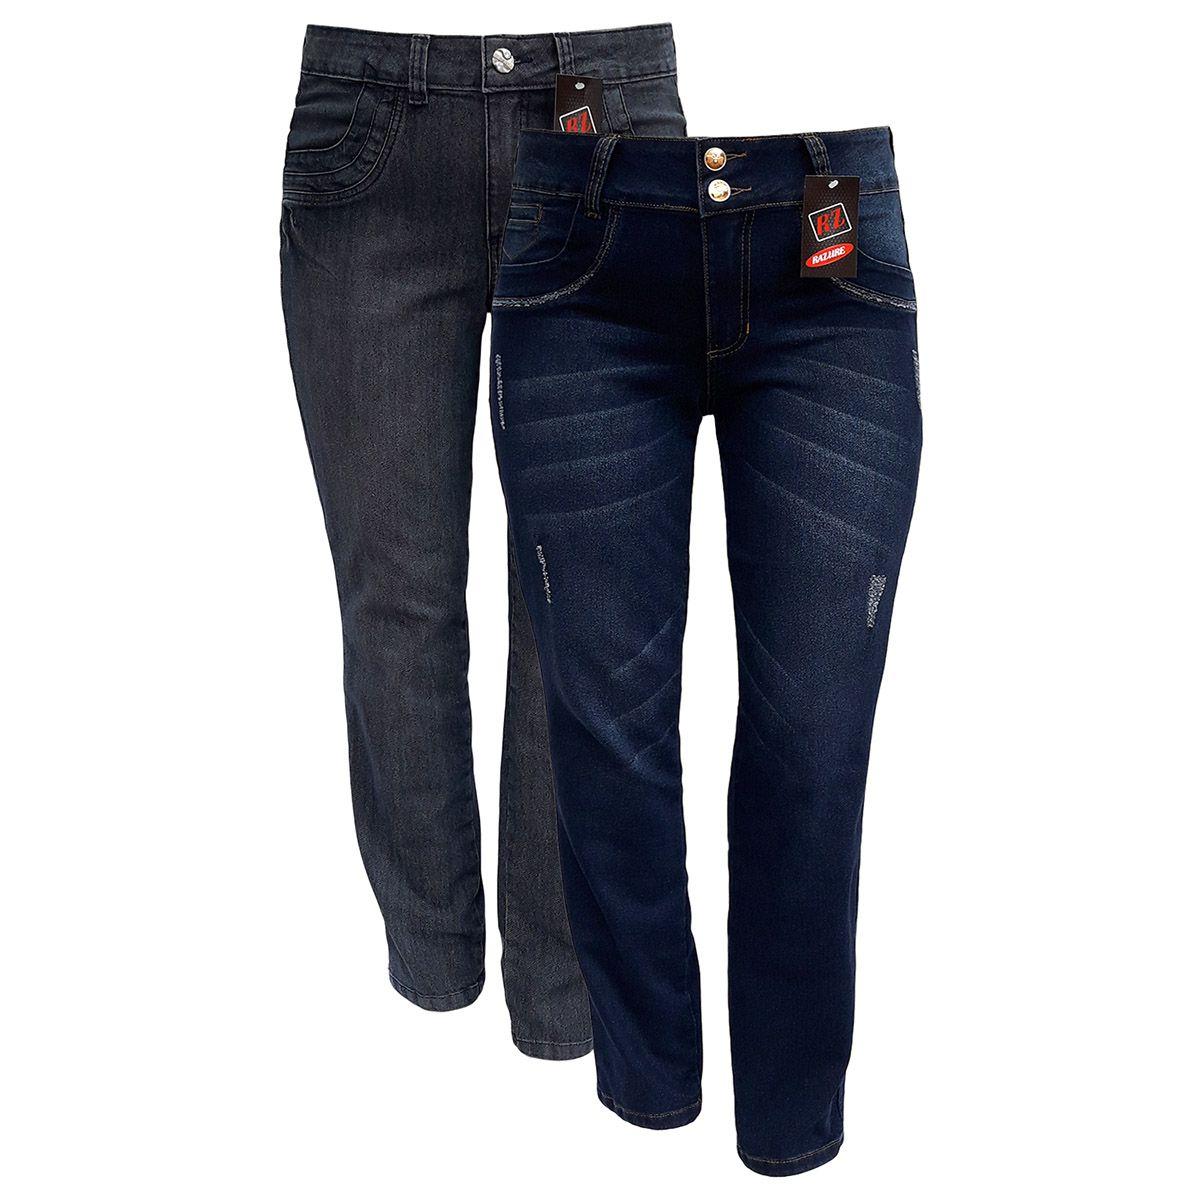 Kit 02 Calças Jeans Feminina Plus Size Tamanho 48